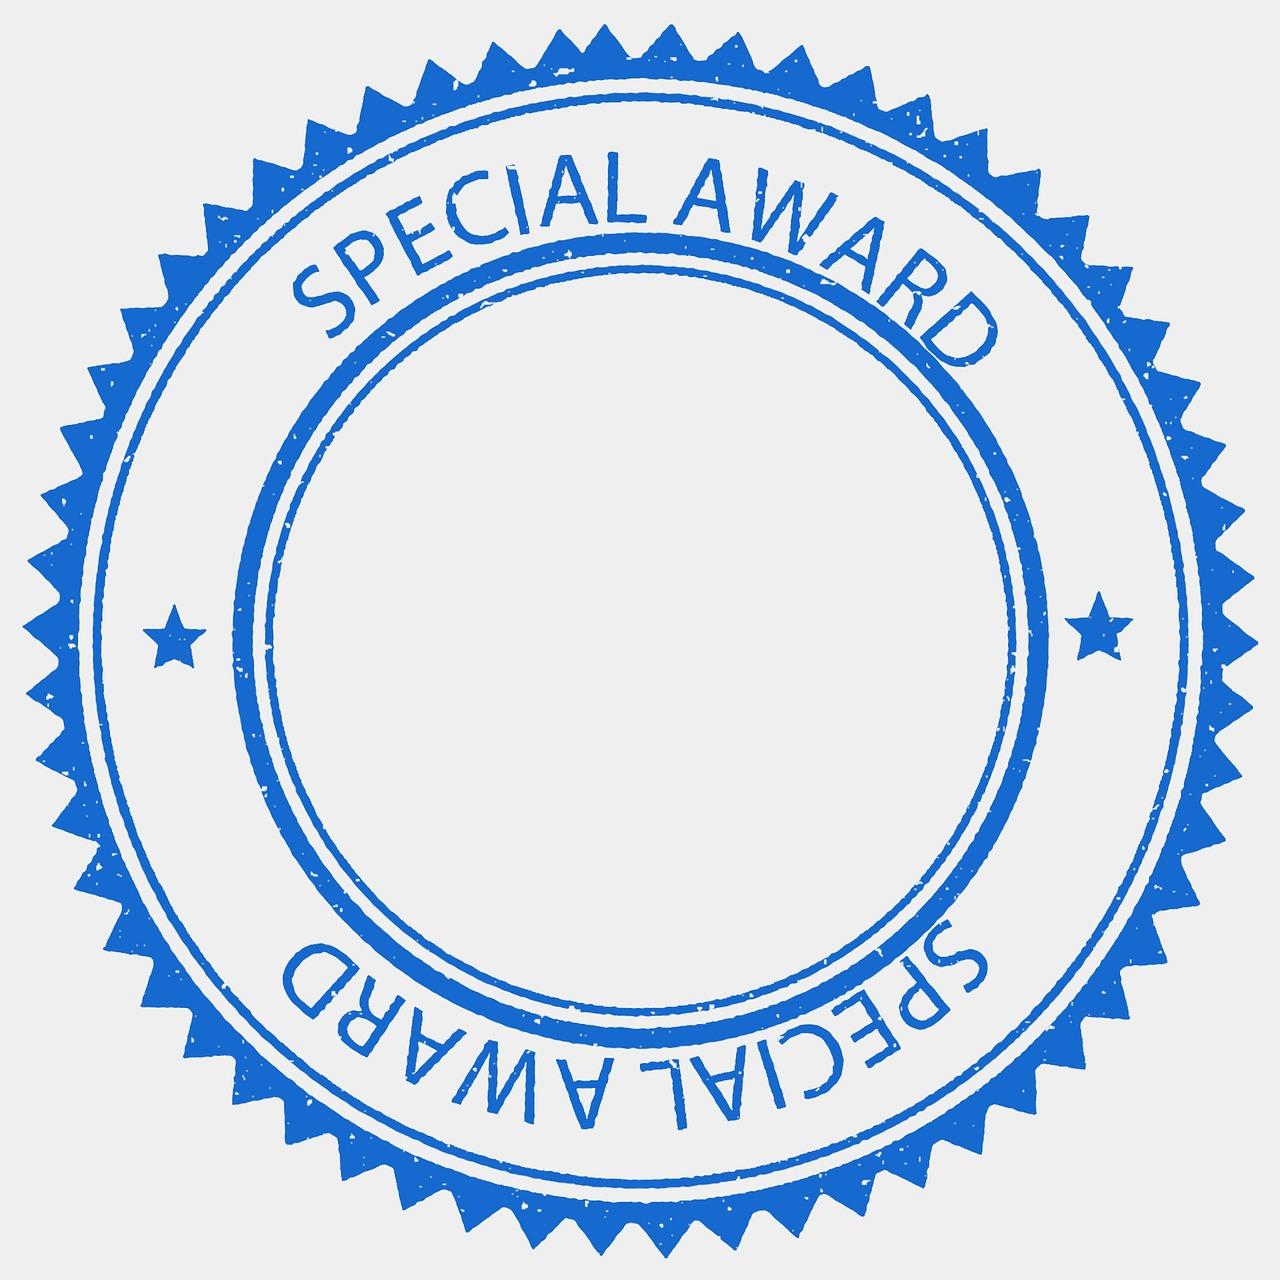 Professor Emeritus award